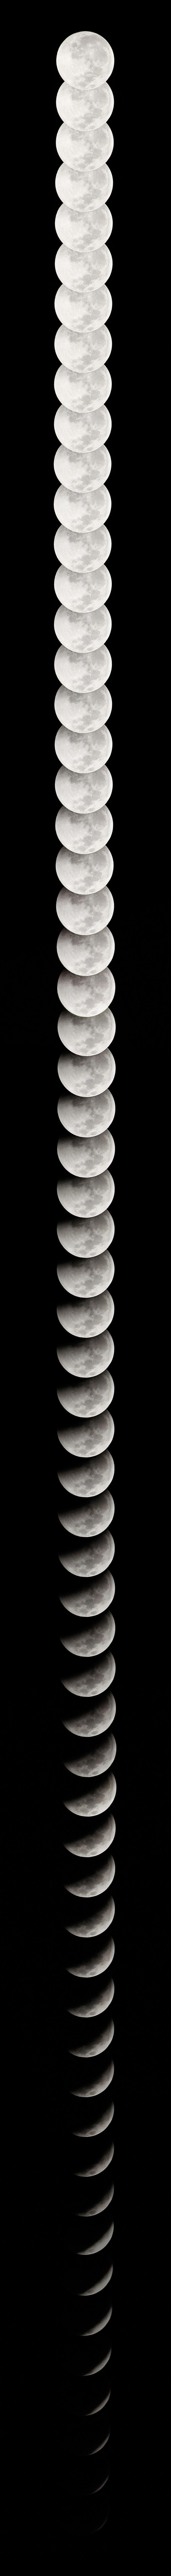 20101221_lunar_eclipse_scroll